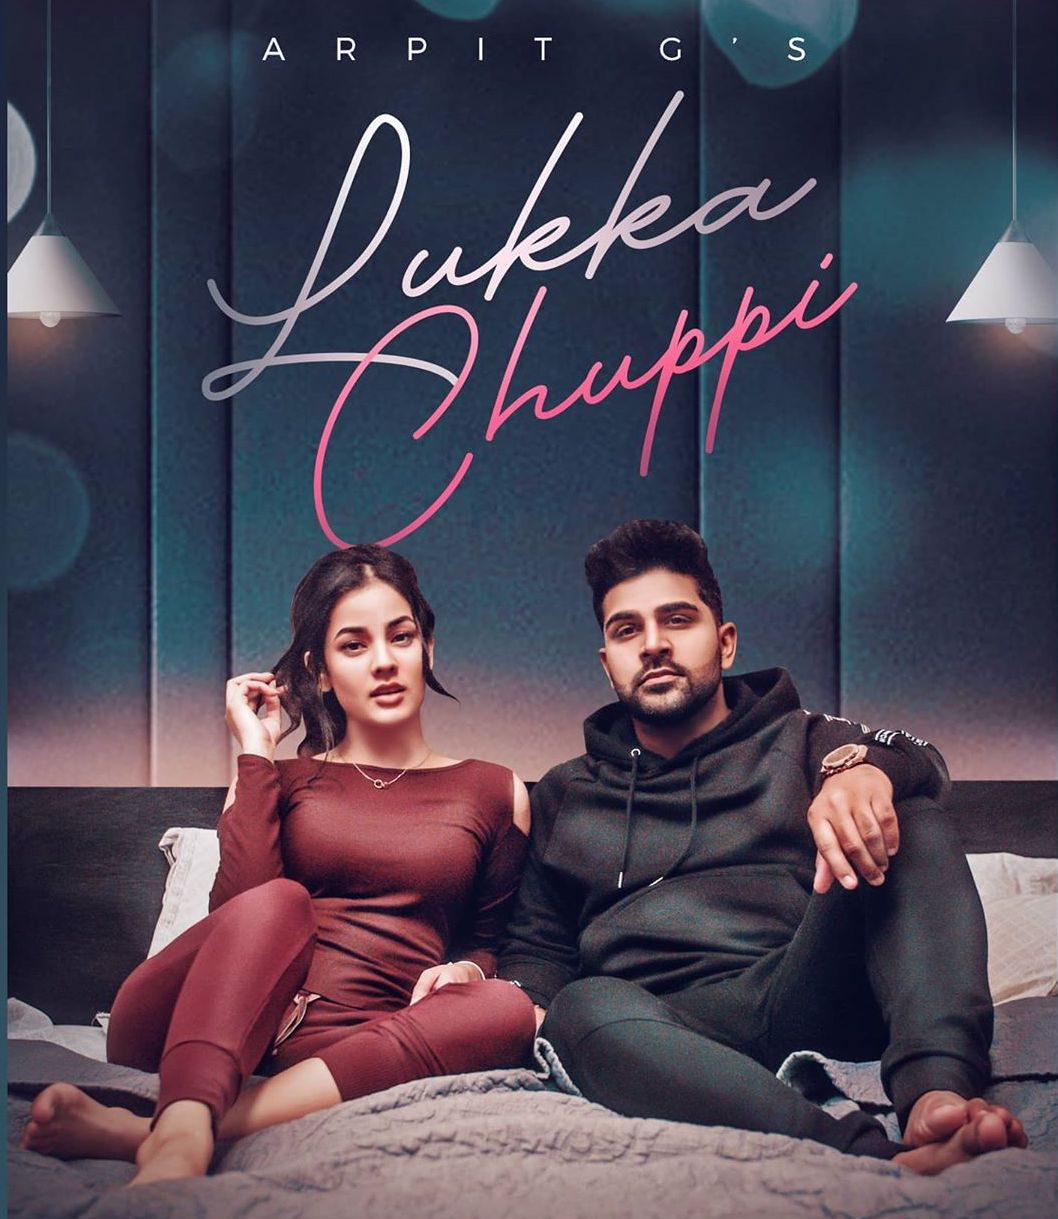 Arpit G - Lukha Chuppi